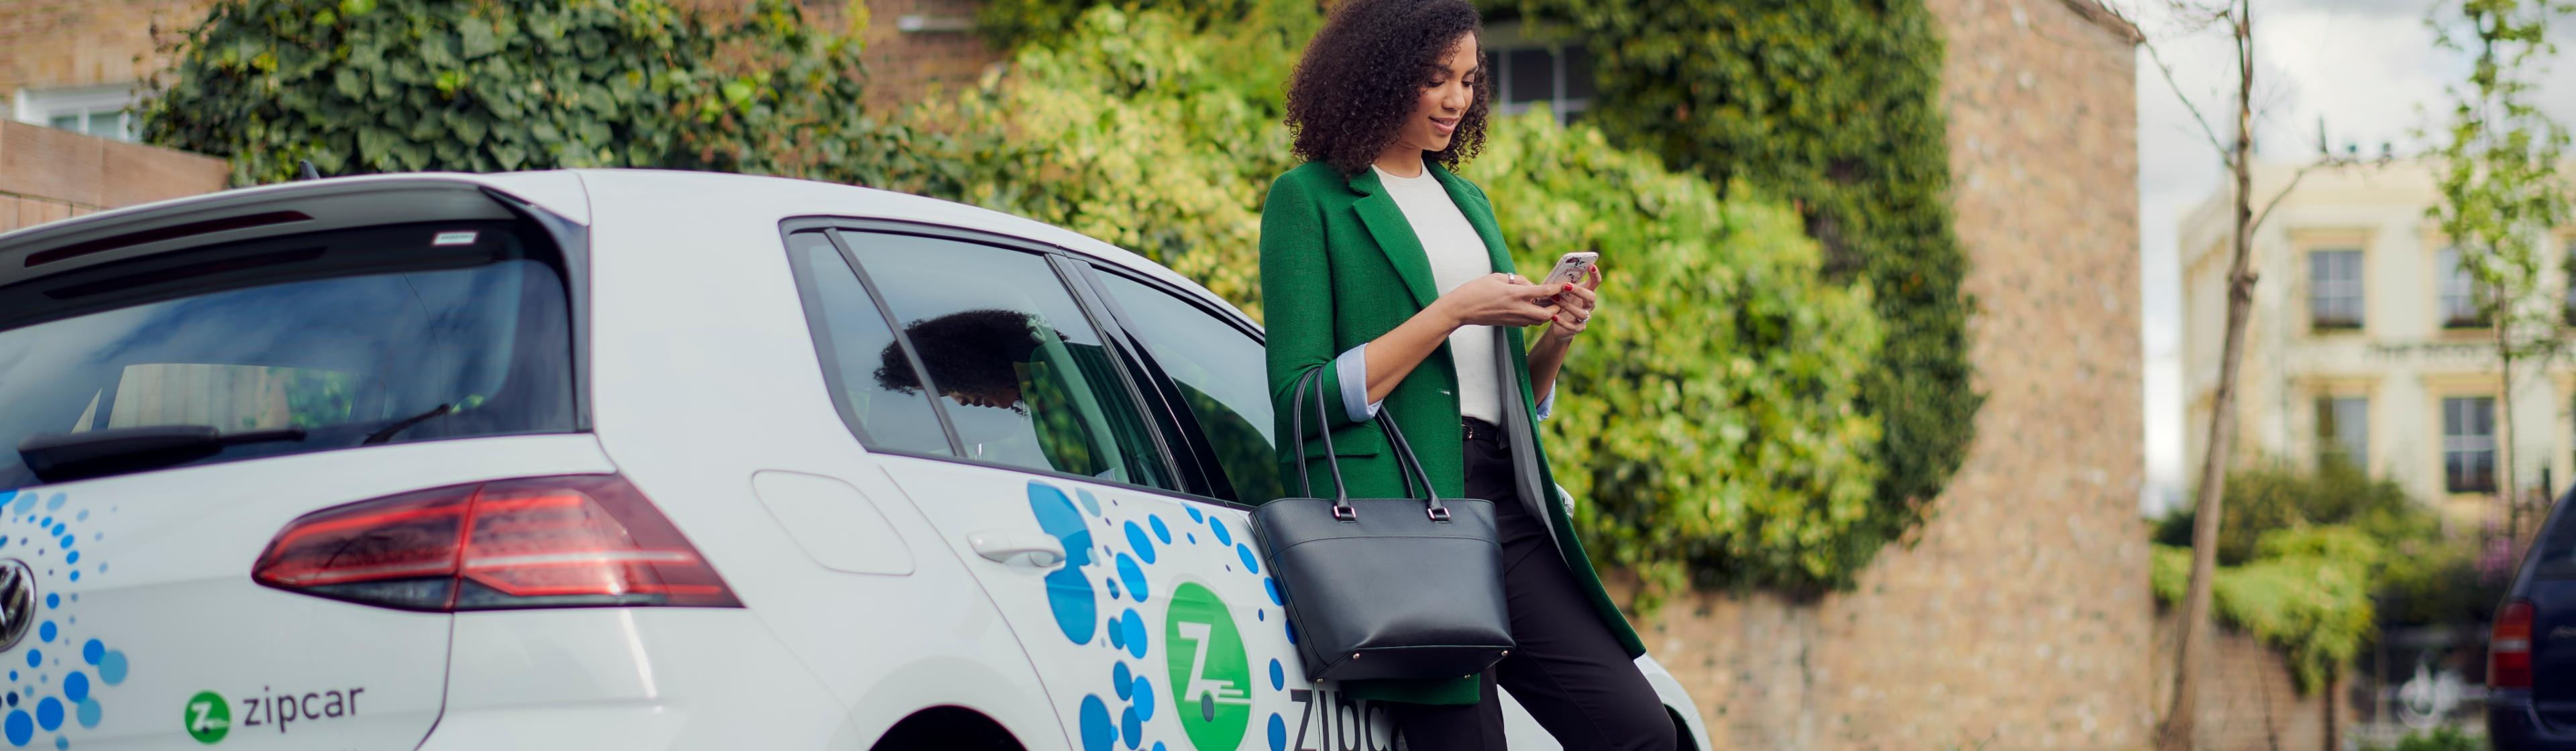 woman leaning on zipcar rental car